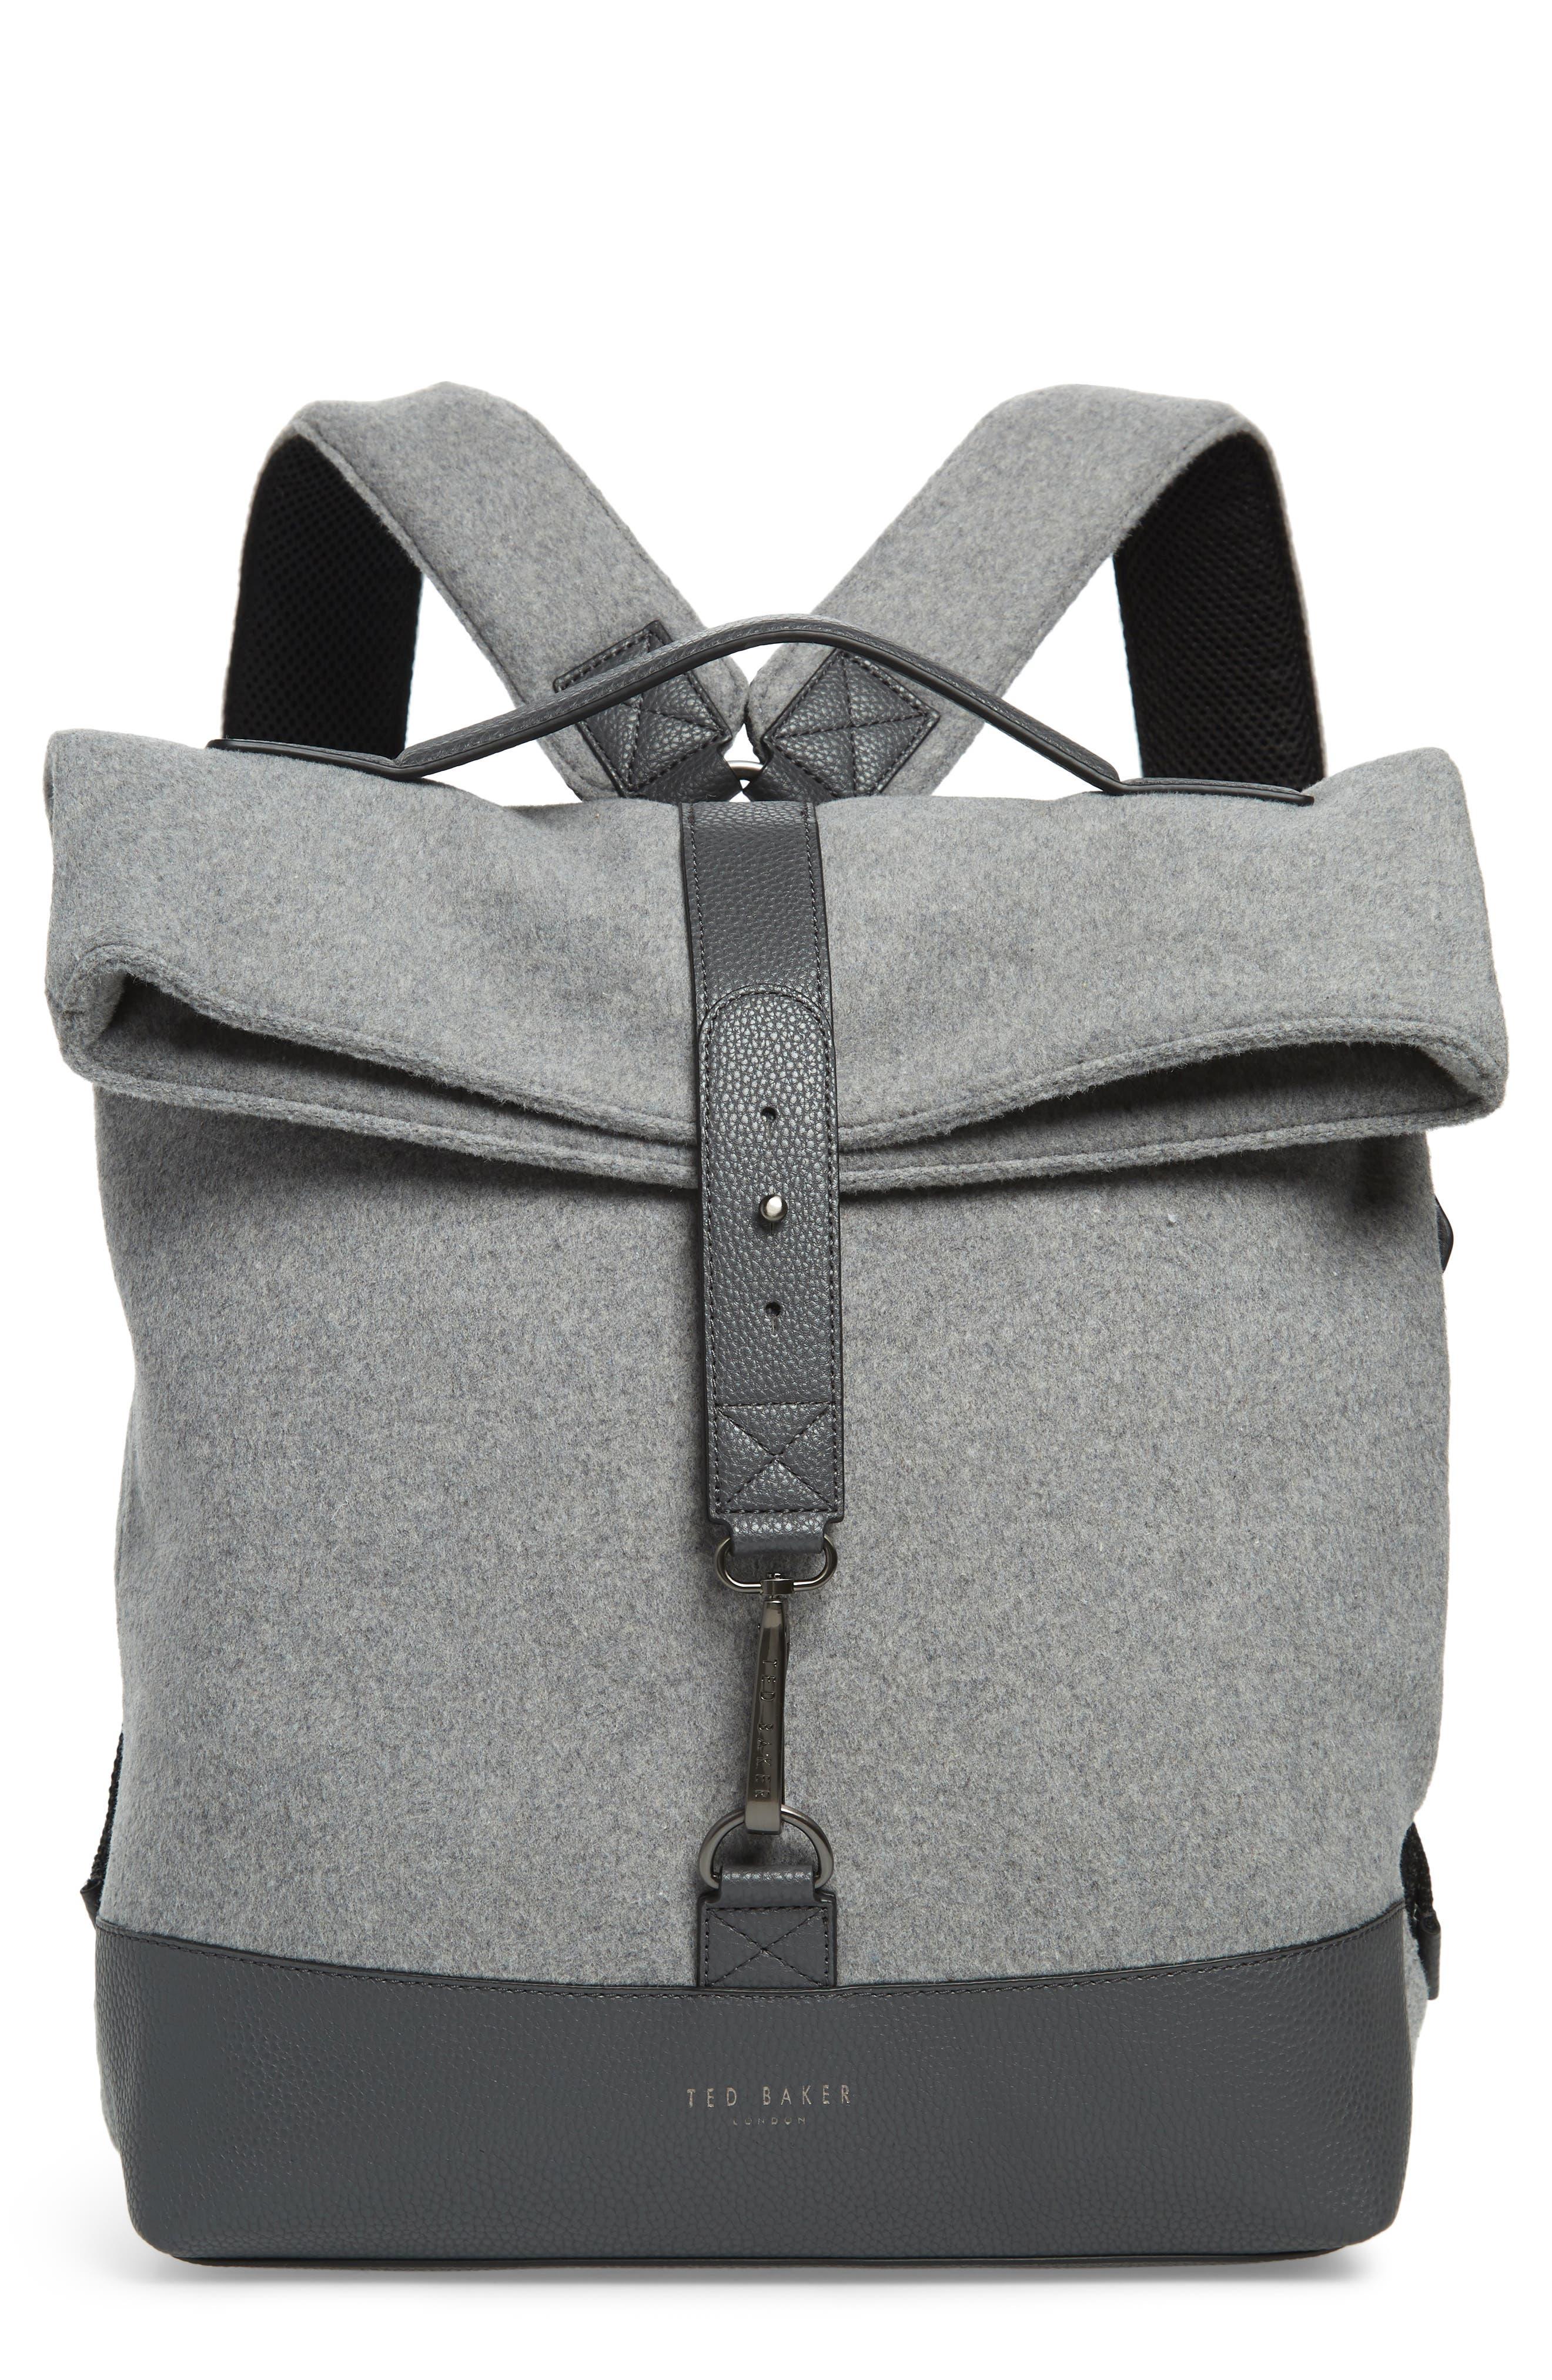 Cashed Backpack,                         Main,                         color, GREY